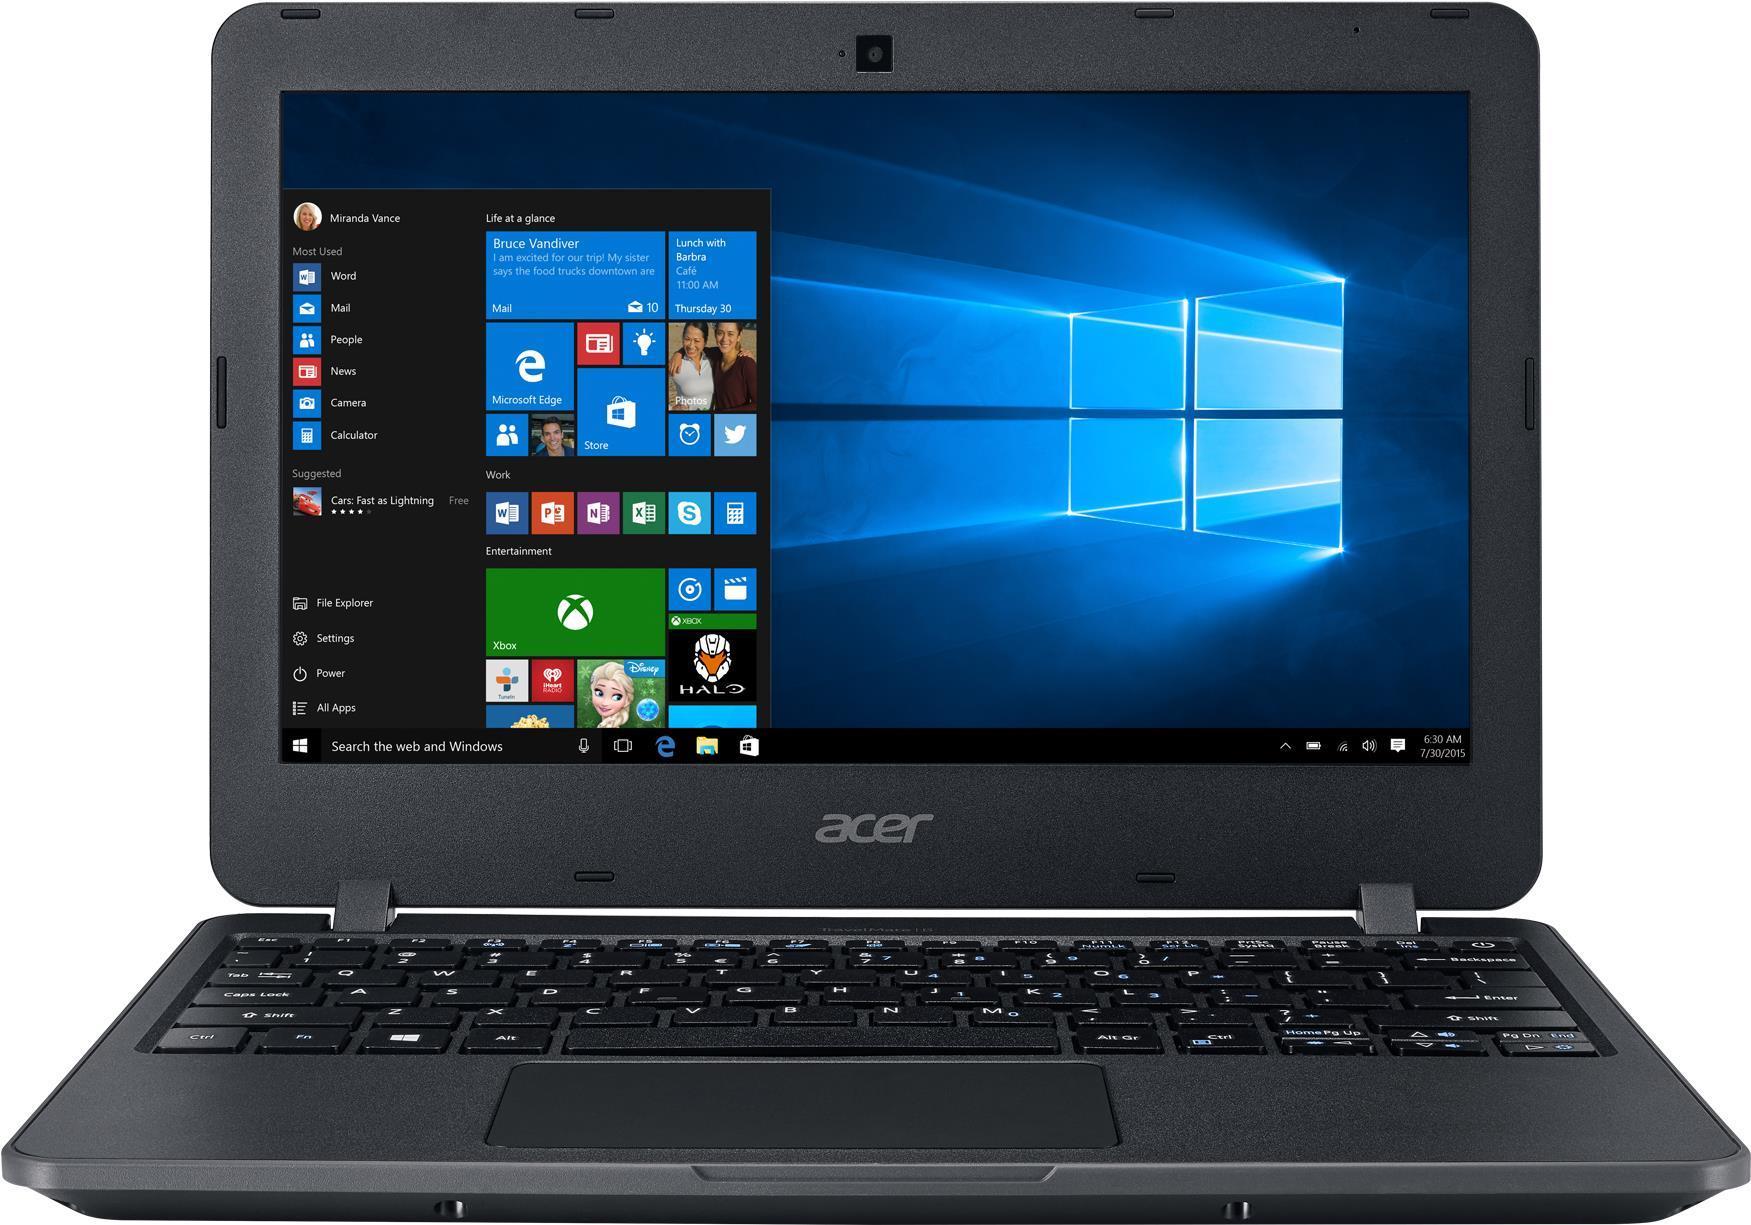 Notebooks, Laptops - Acer TravelMate B117 M P72Q Pentium N3710 1.6 GHz Windows 10 S 64 bit 4 GB RAM 64 GB eMMC 29.5 cm (11.6) 1366 x 768 (HD) HD Graphics 405 Wi Fi, Bluetooth Schwarz kbd Deutsch  - Onlineshop JACOB Elektronik